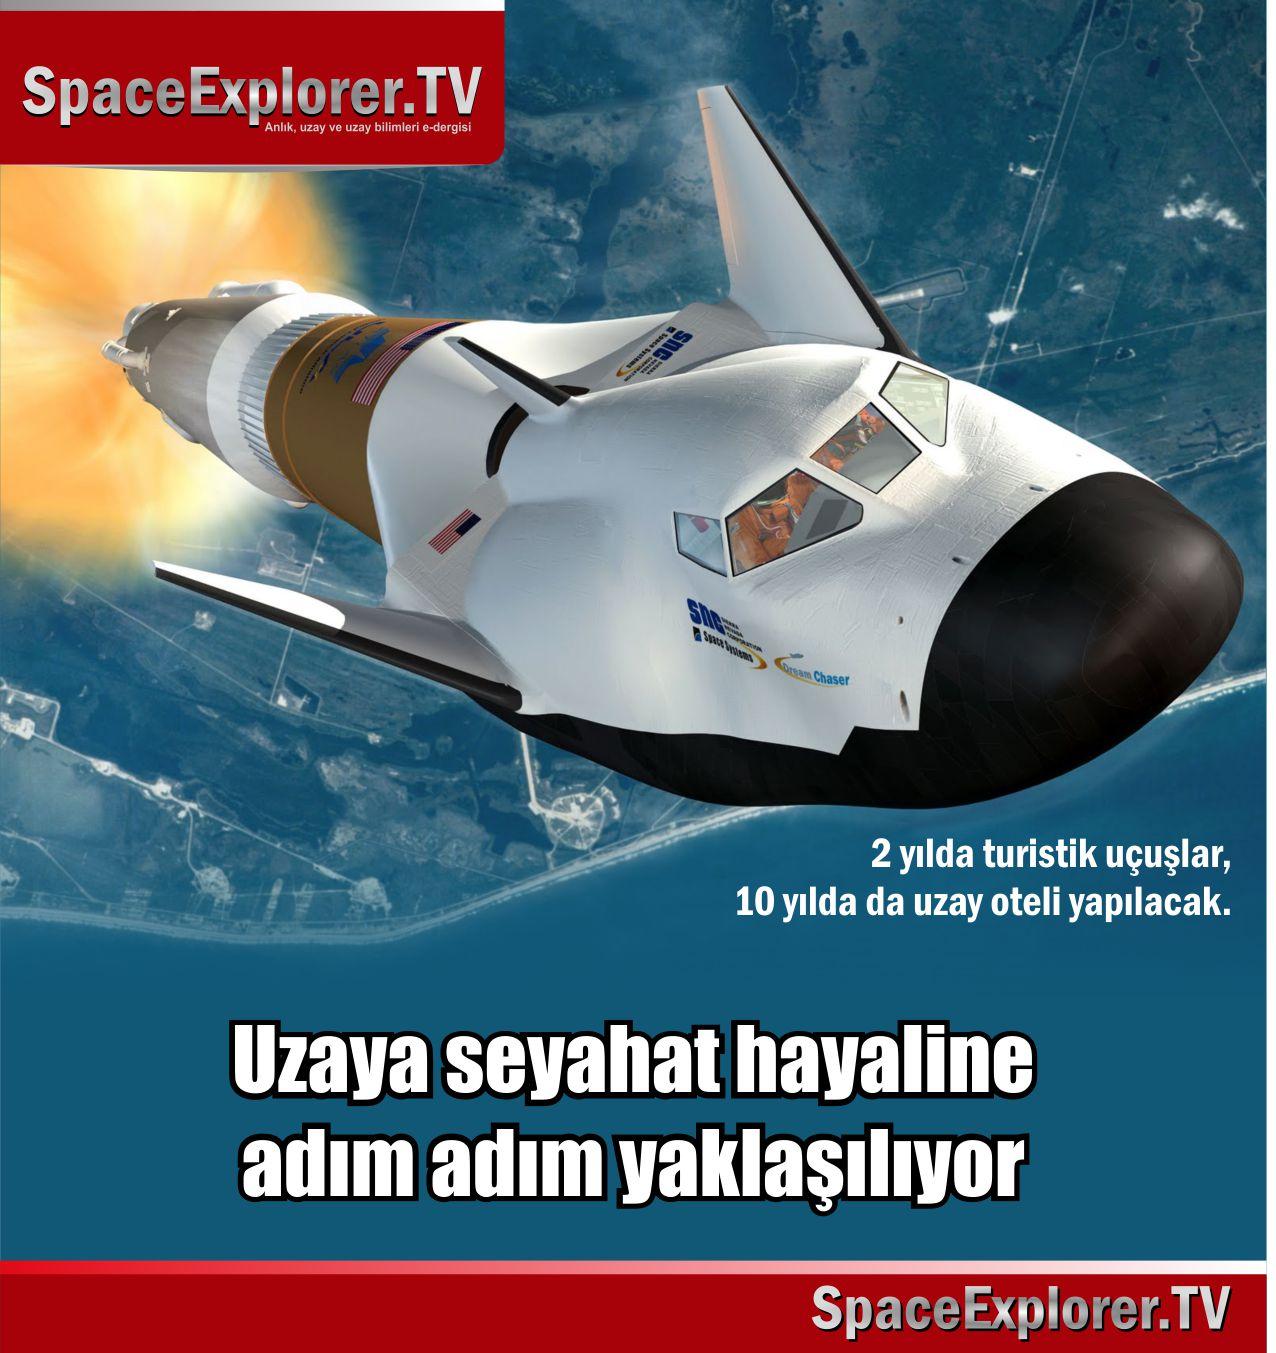 Space Explorer, Uzay seyahati, Uzay oteli, İngiltere, ABD, Uzay turizmi, Videolar,